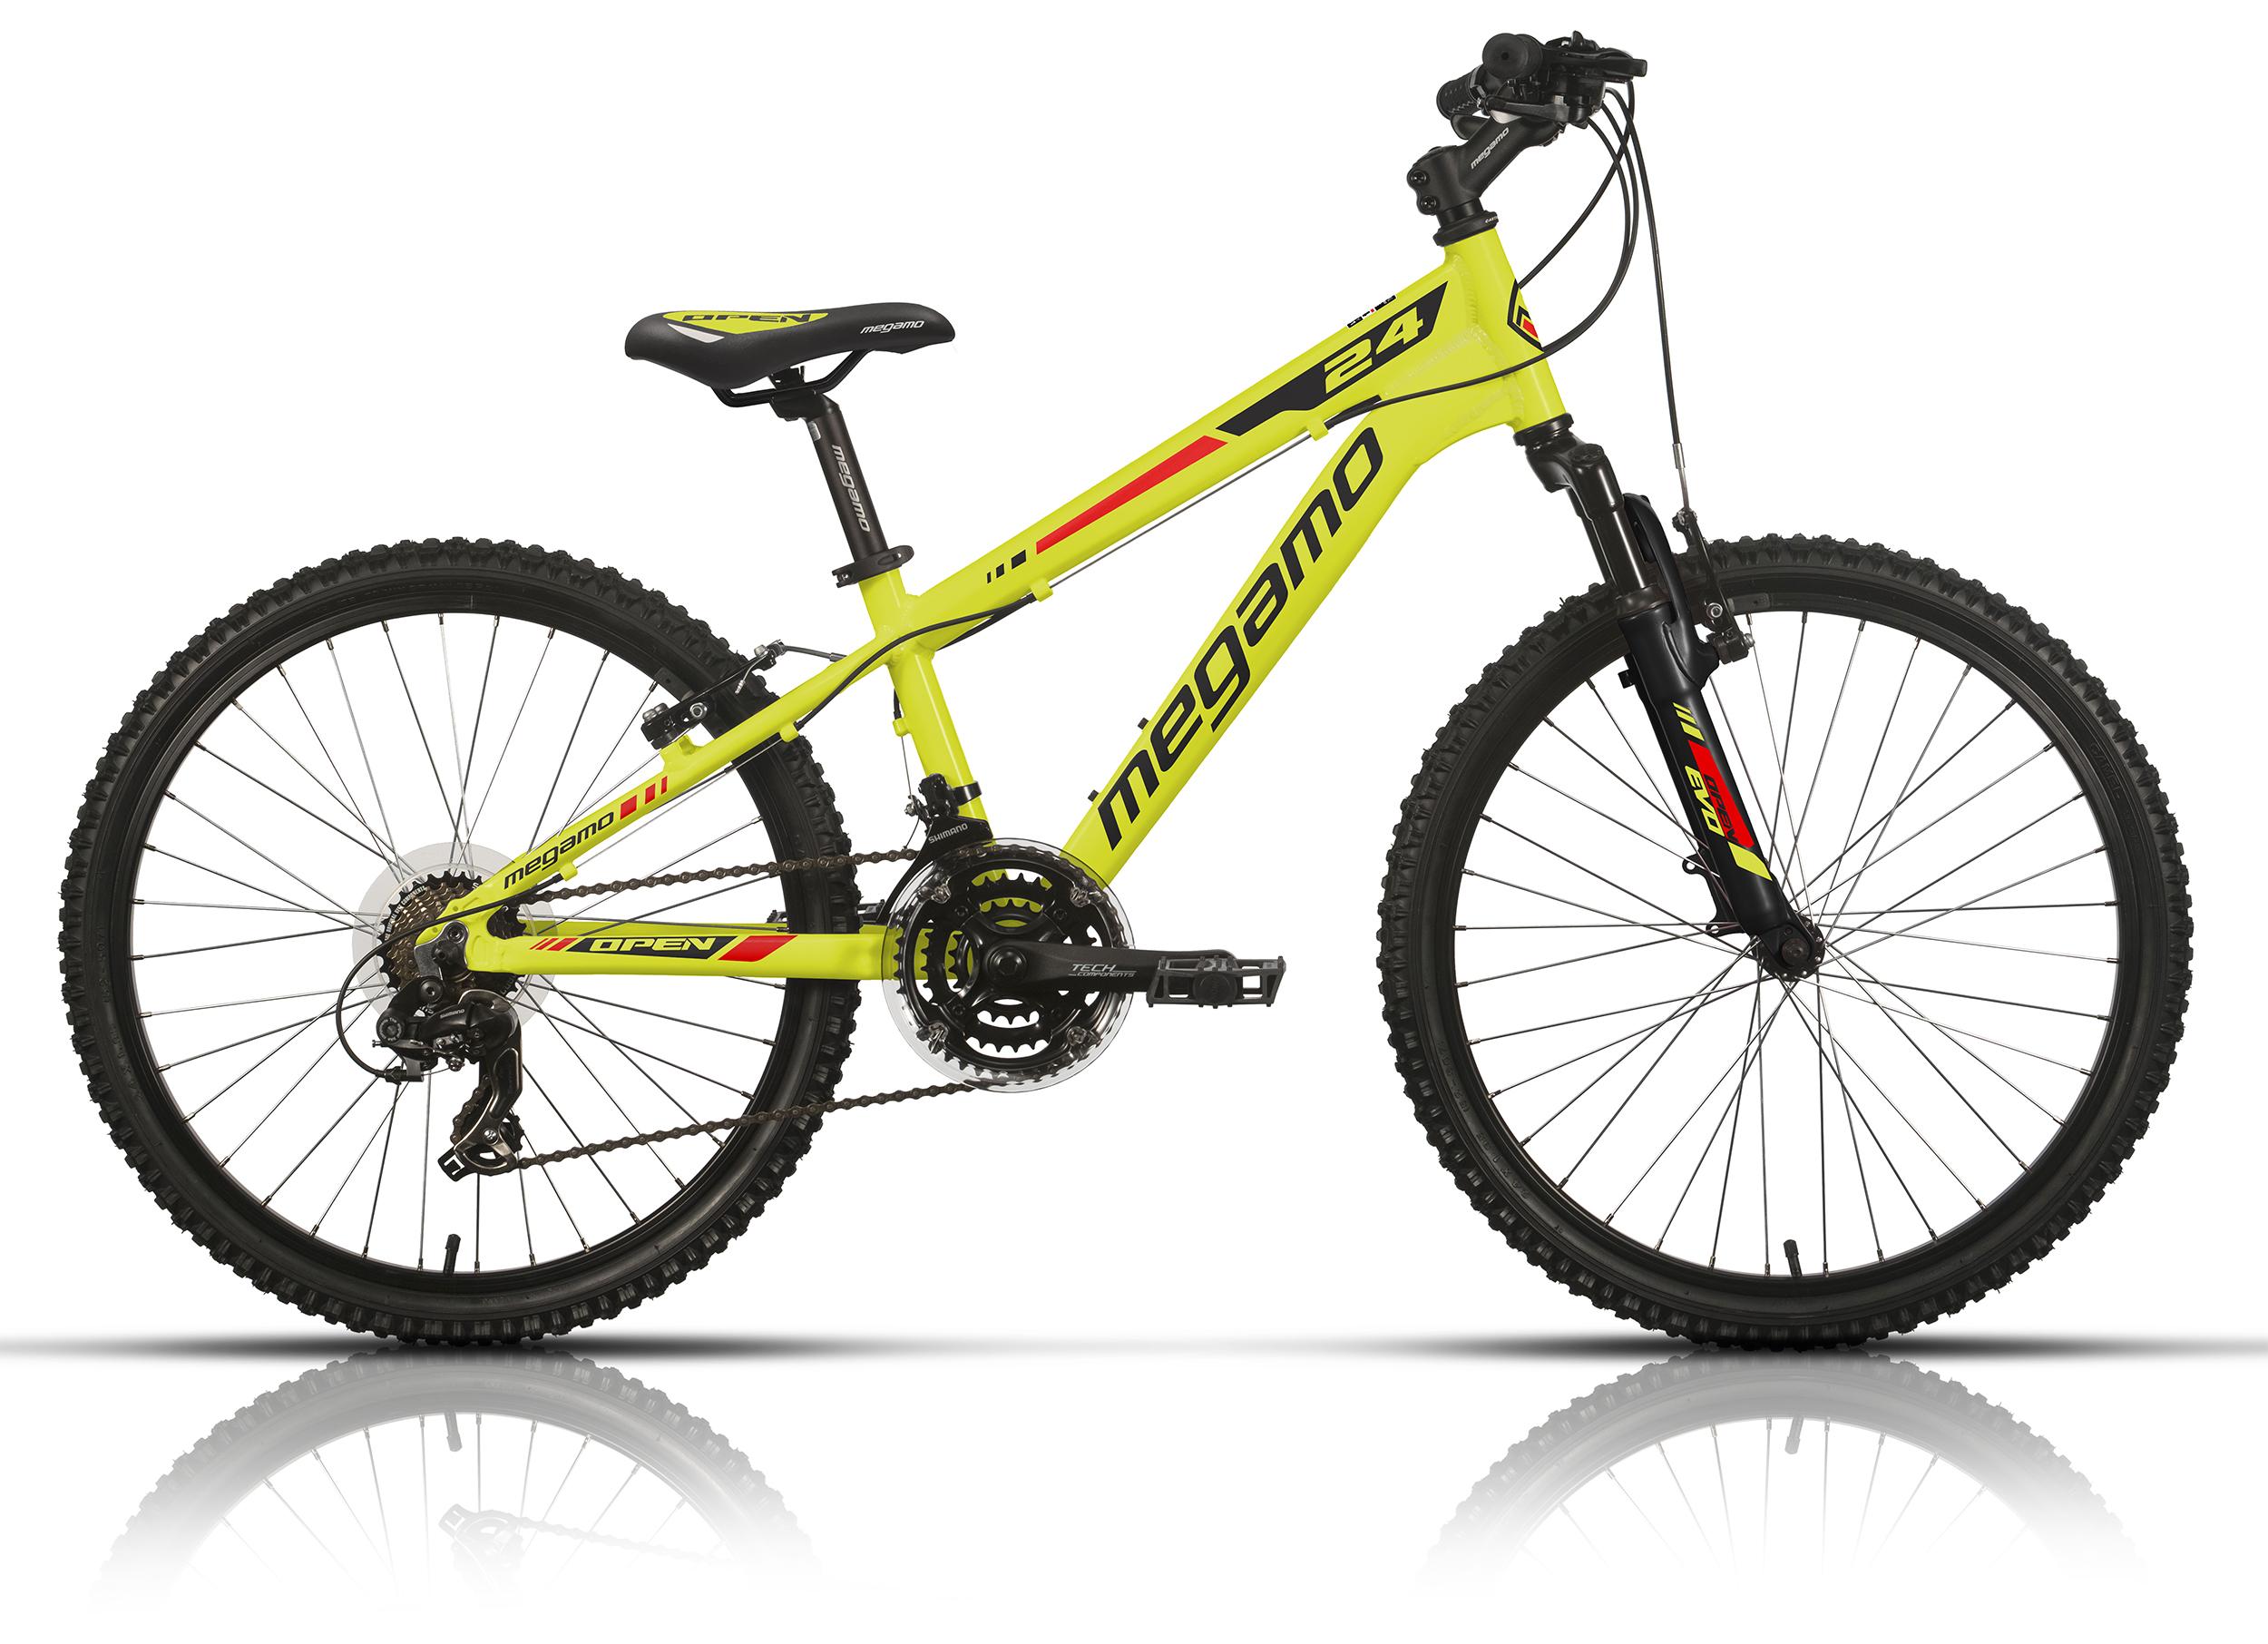 OPEN JUNIOR BOY - Megamo Bicycles